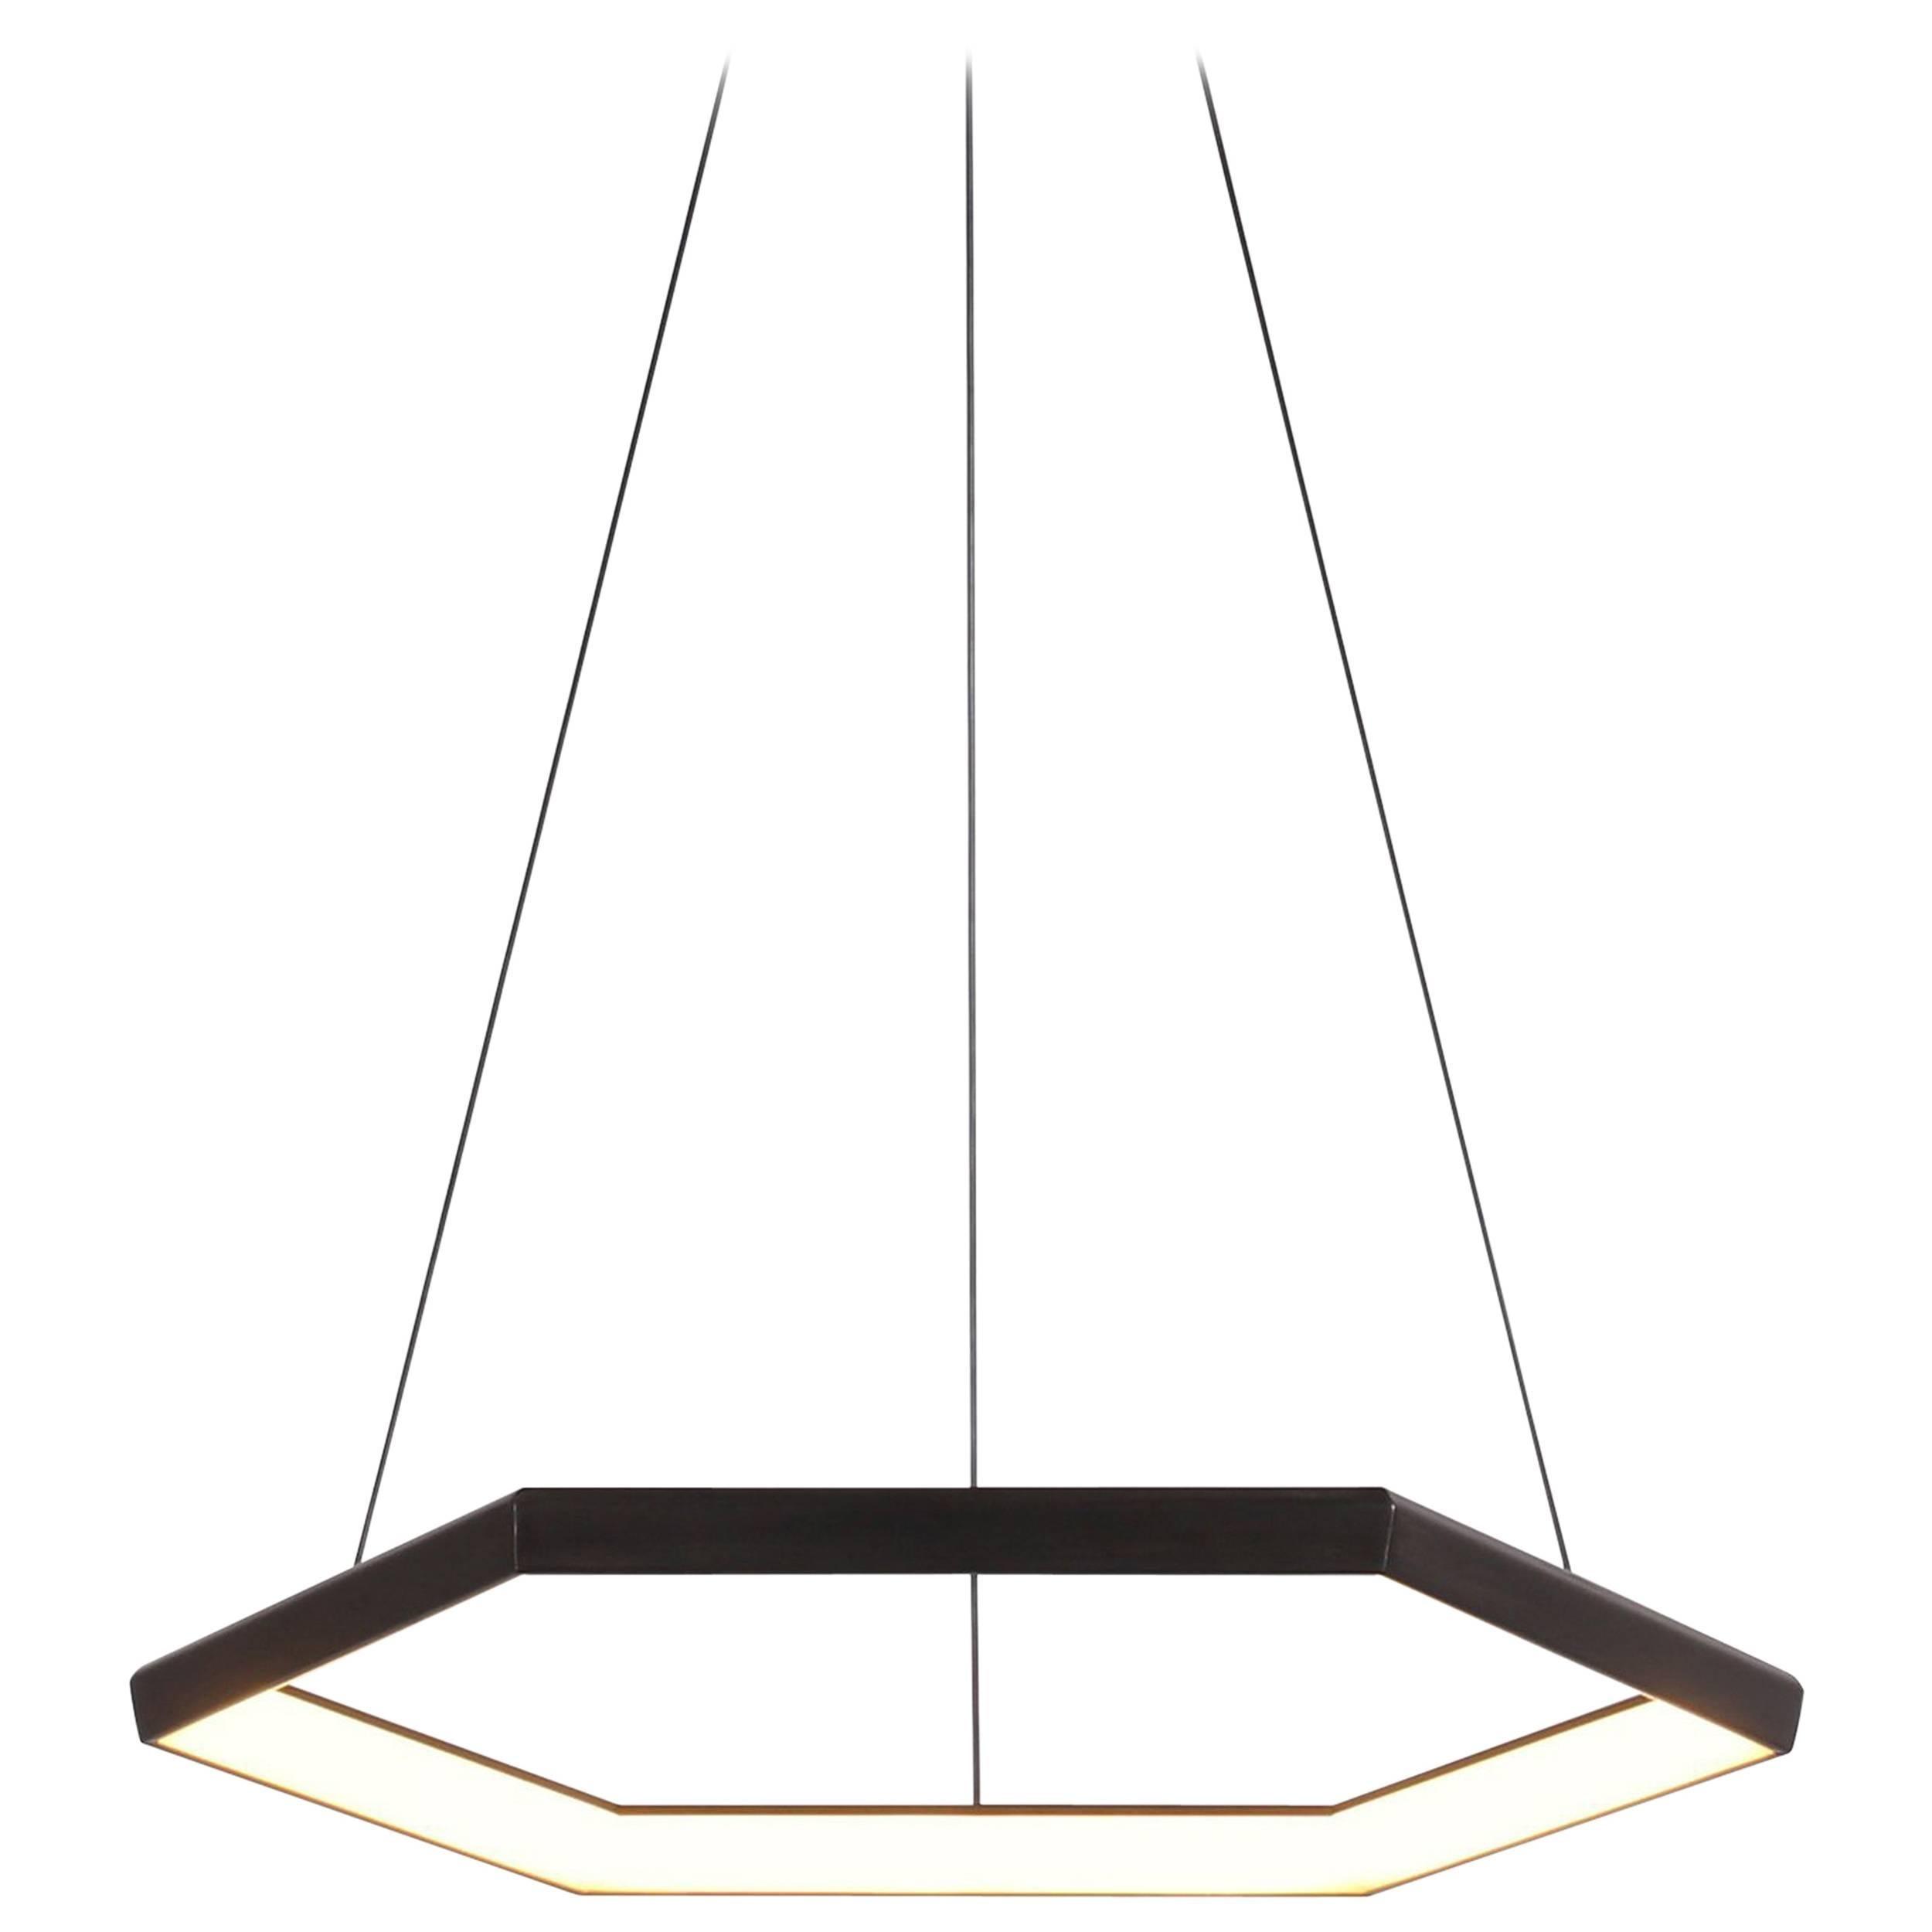 HEXIA HX28 - Black Hexagon Geometric Modern LED Chandelier Light Fixture